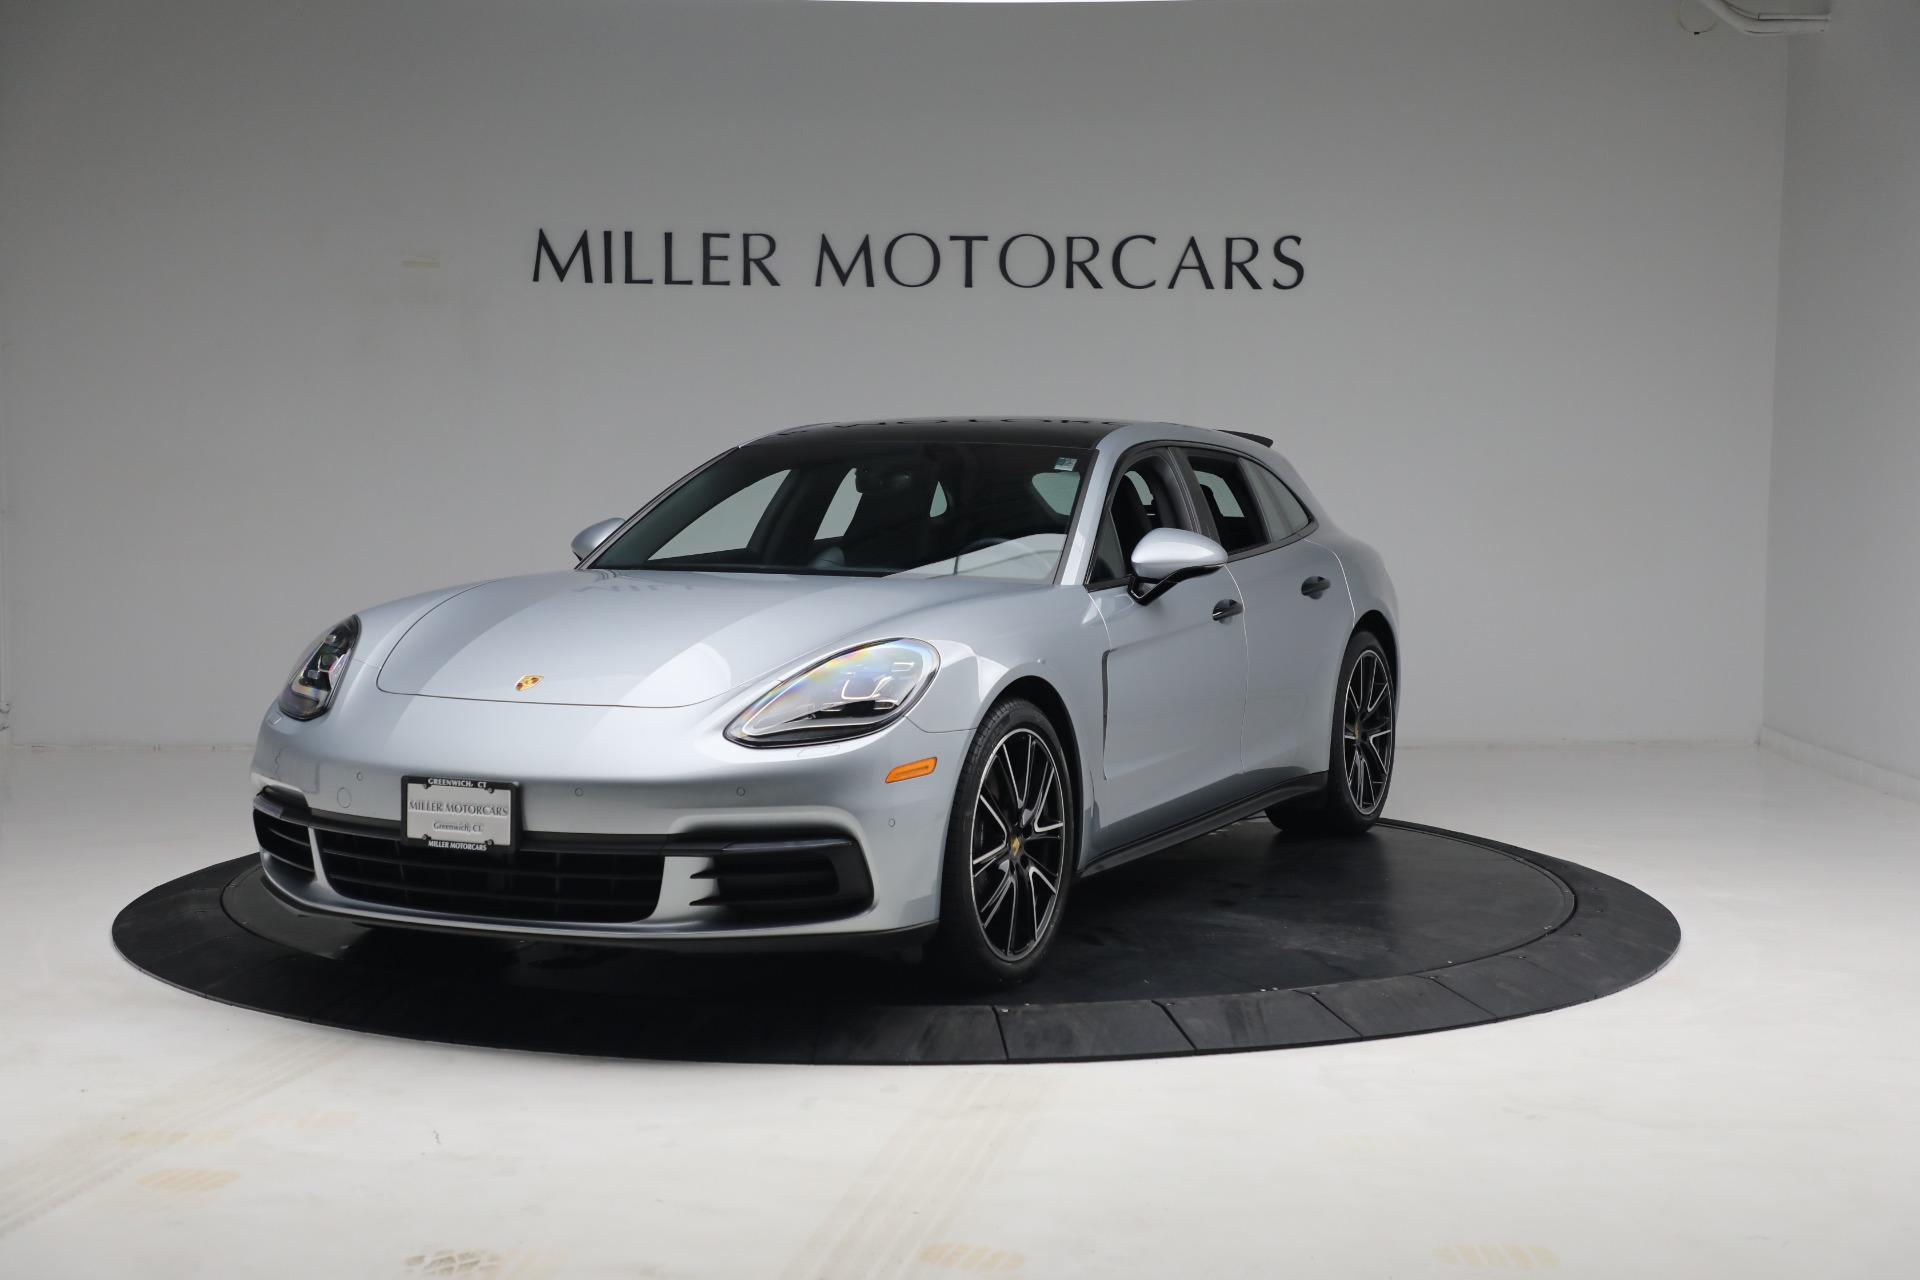 Used 2018 Porsche Panamera 4 Sport Turismo for sale $97,900 at Pagani of Greenwich in Greenwich CT 06830 1